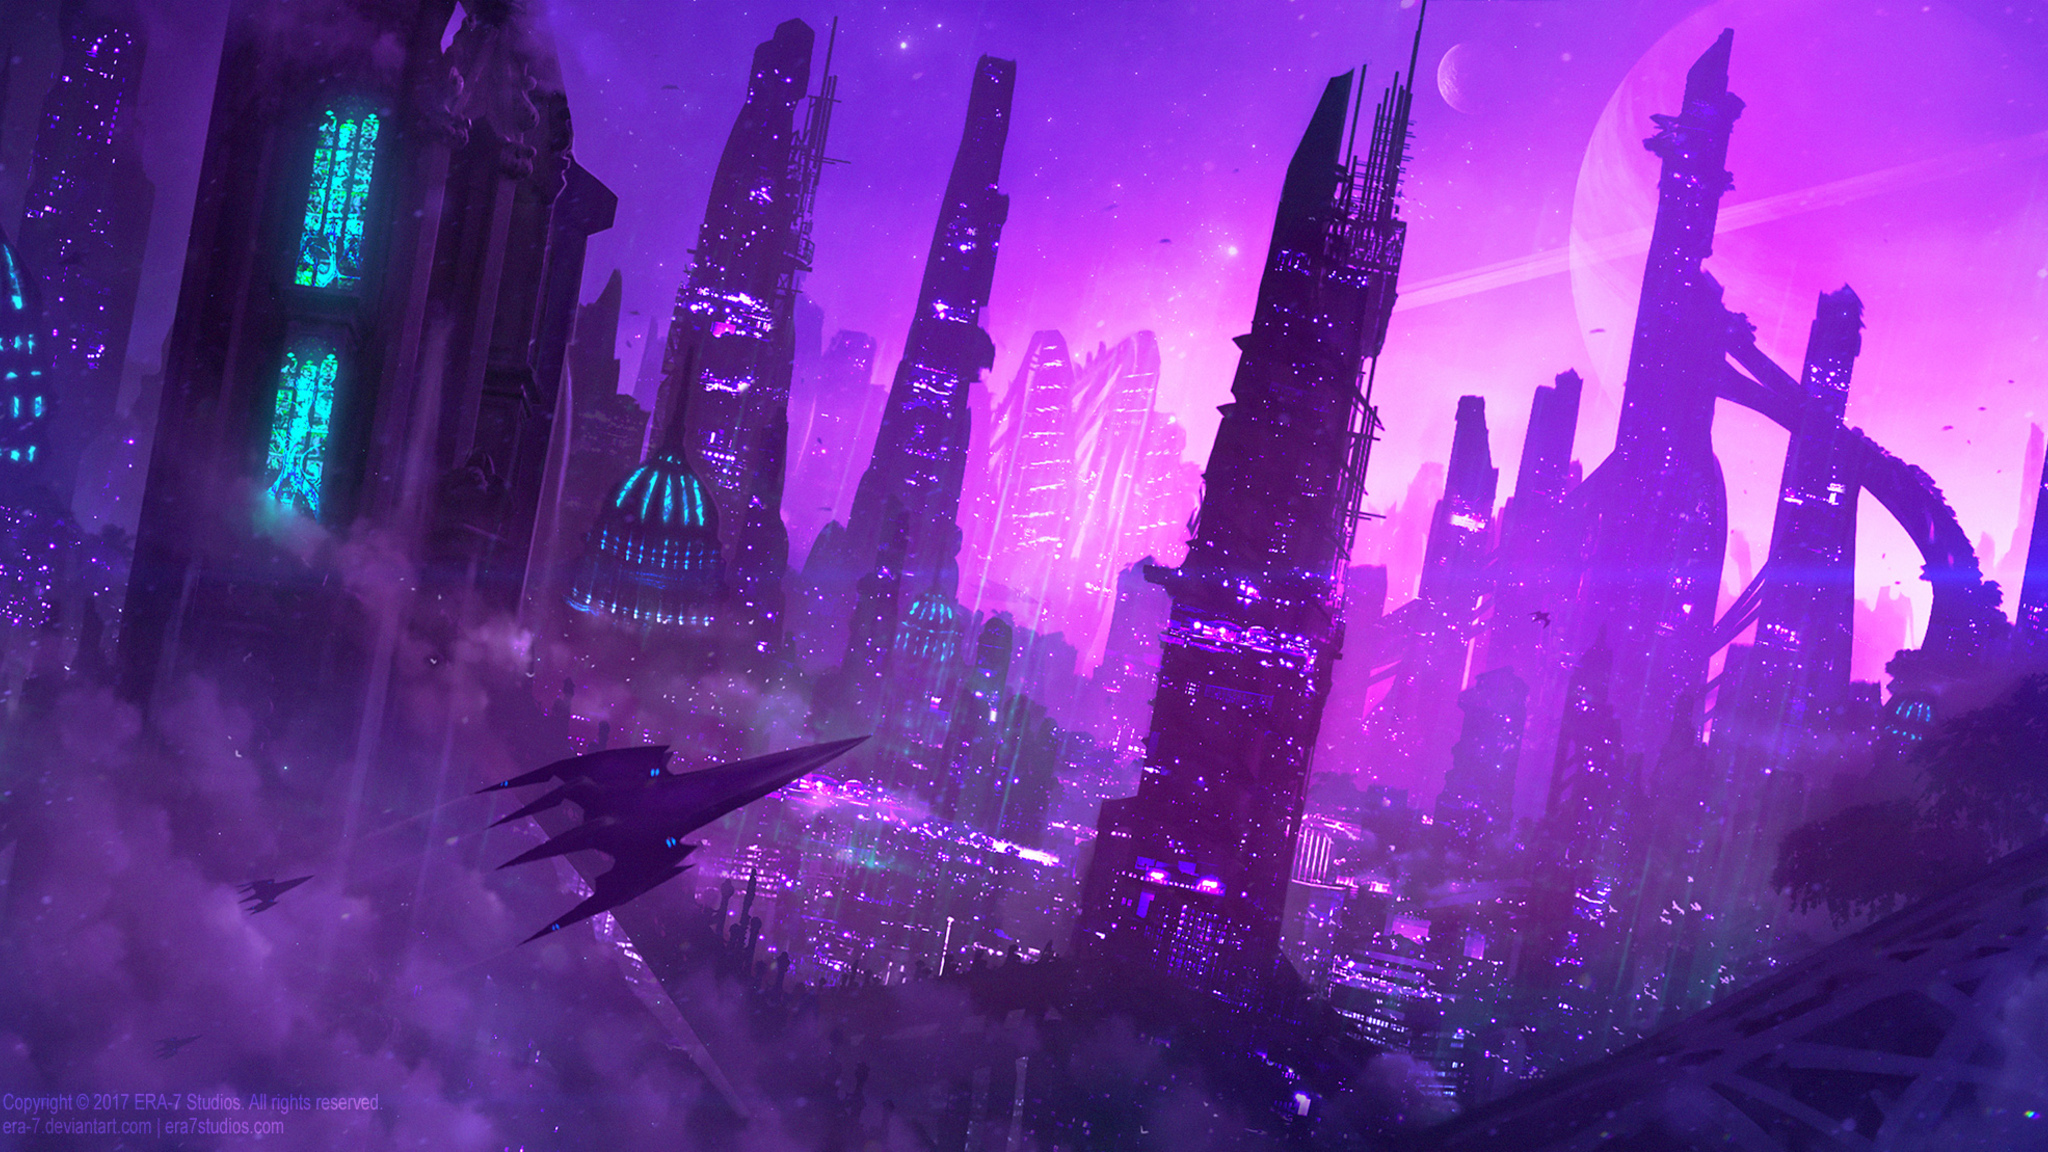 2048x1152 Aliens City 2048x1152 Resolution Hd 4k Wallpapers